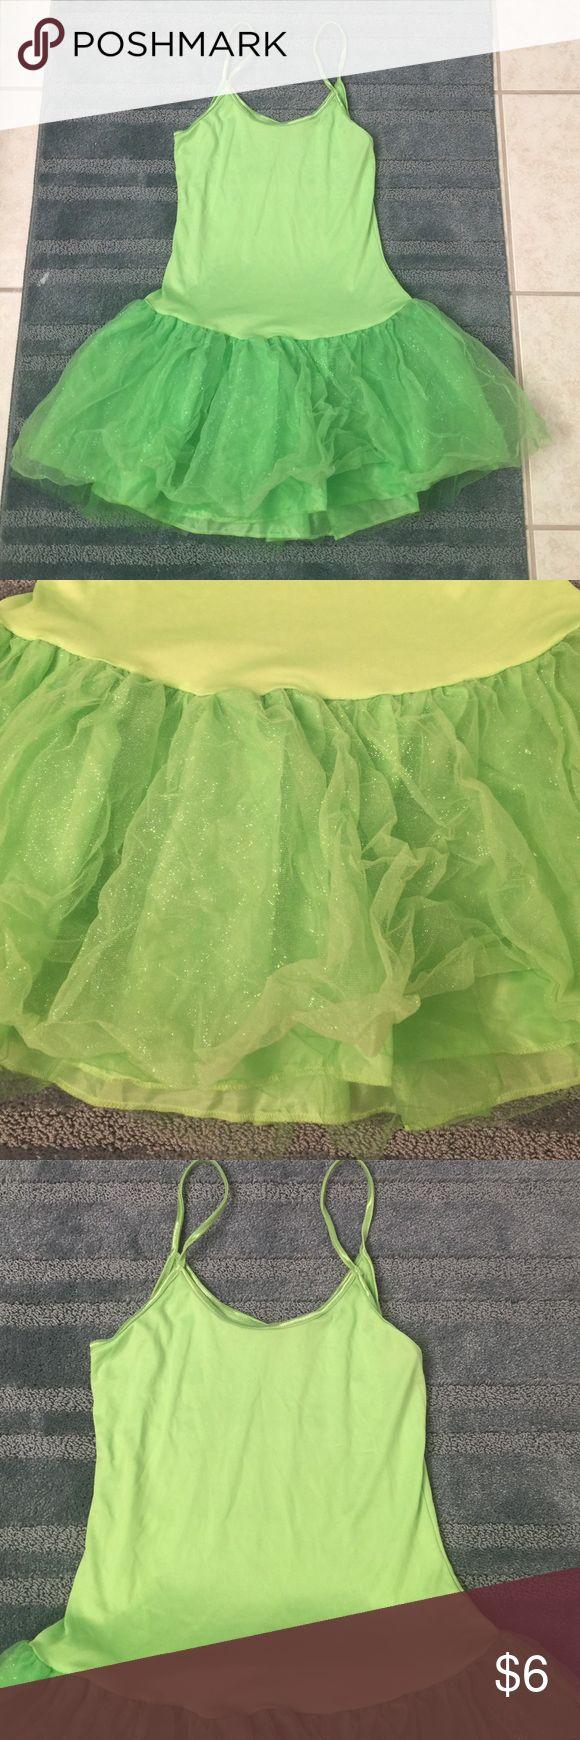 Tinker bell costume Size Large Dresses